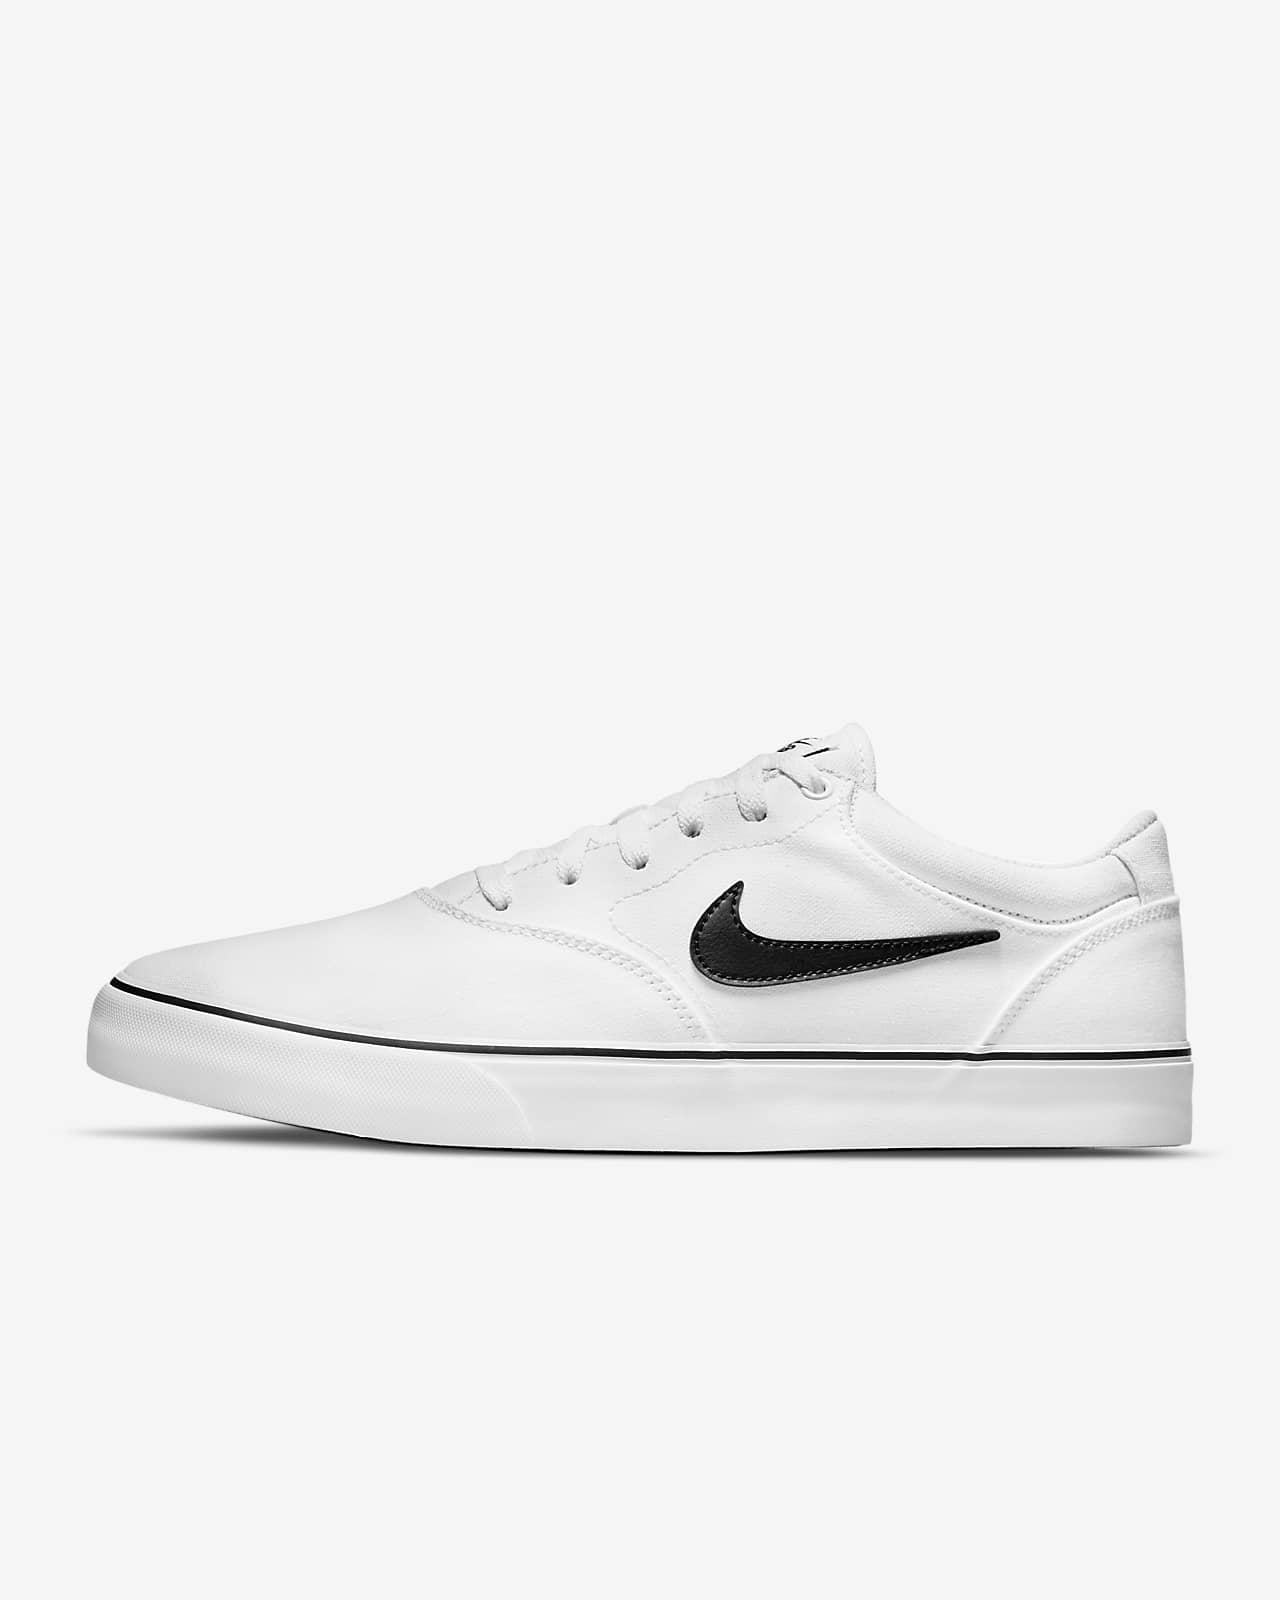 Nike SB Chron 2 Canvas Skate Shoe